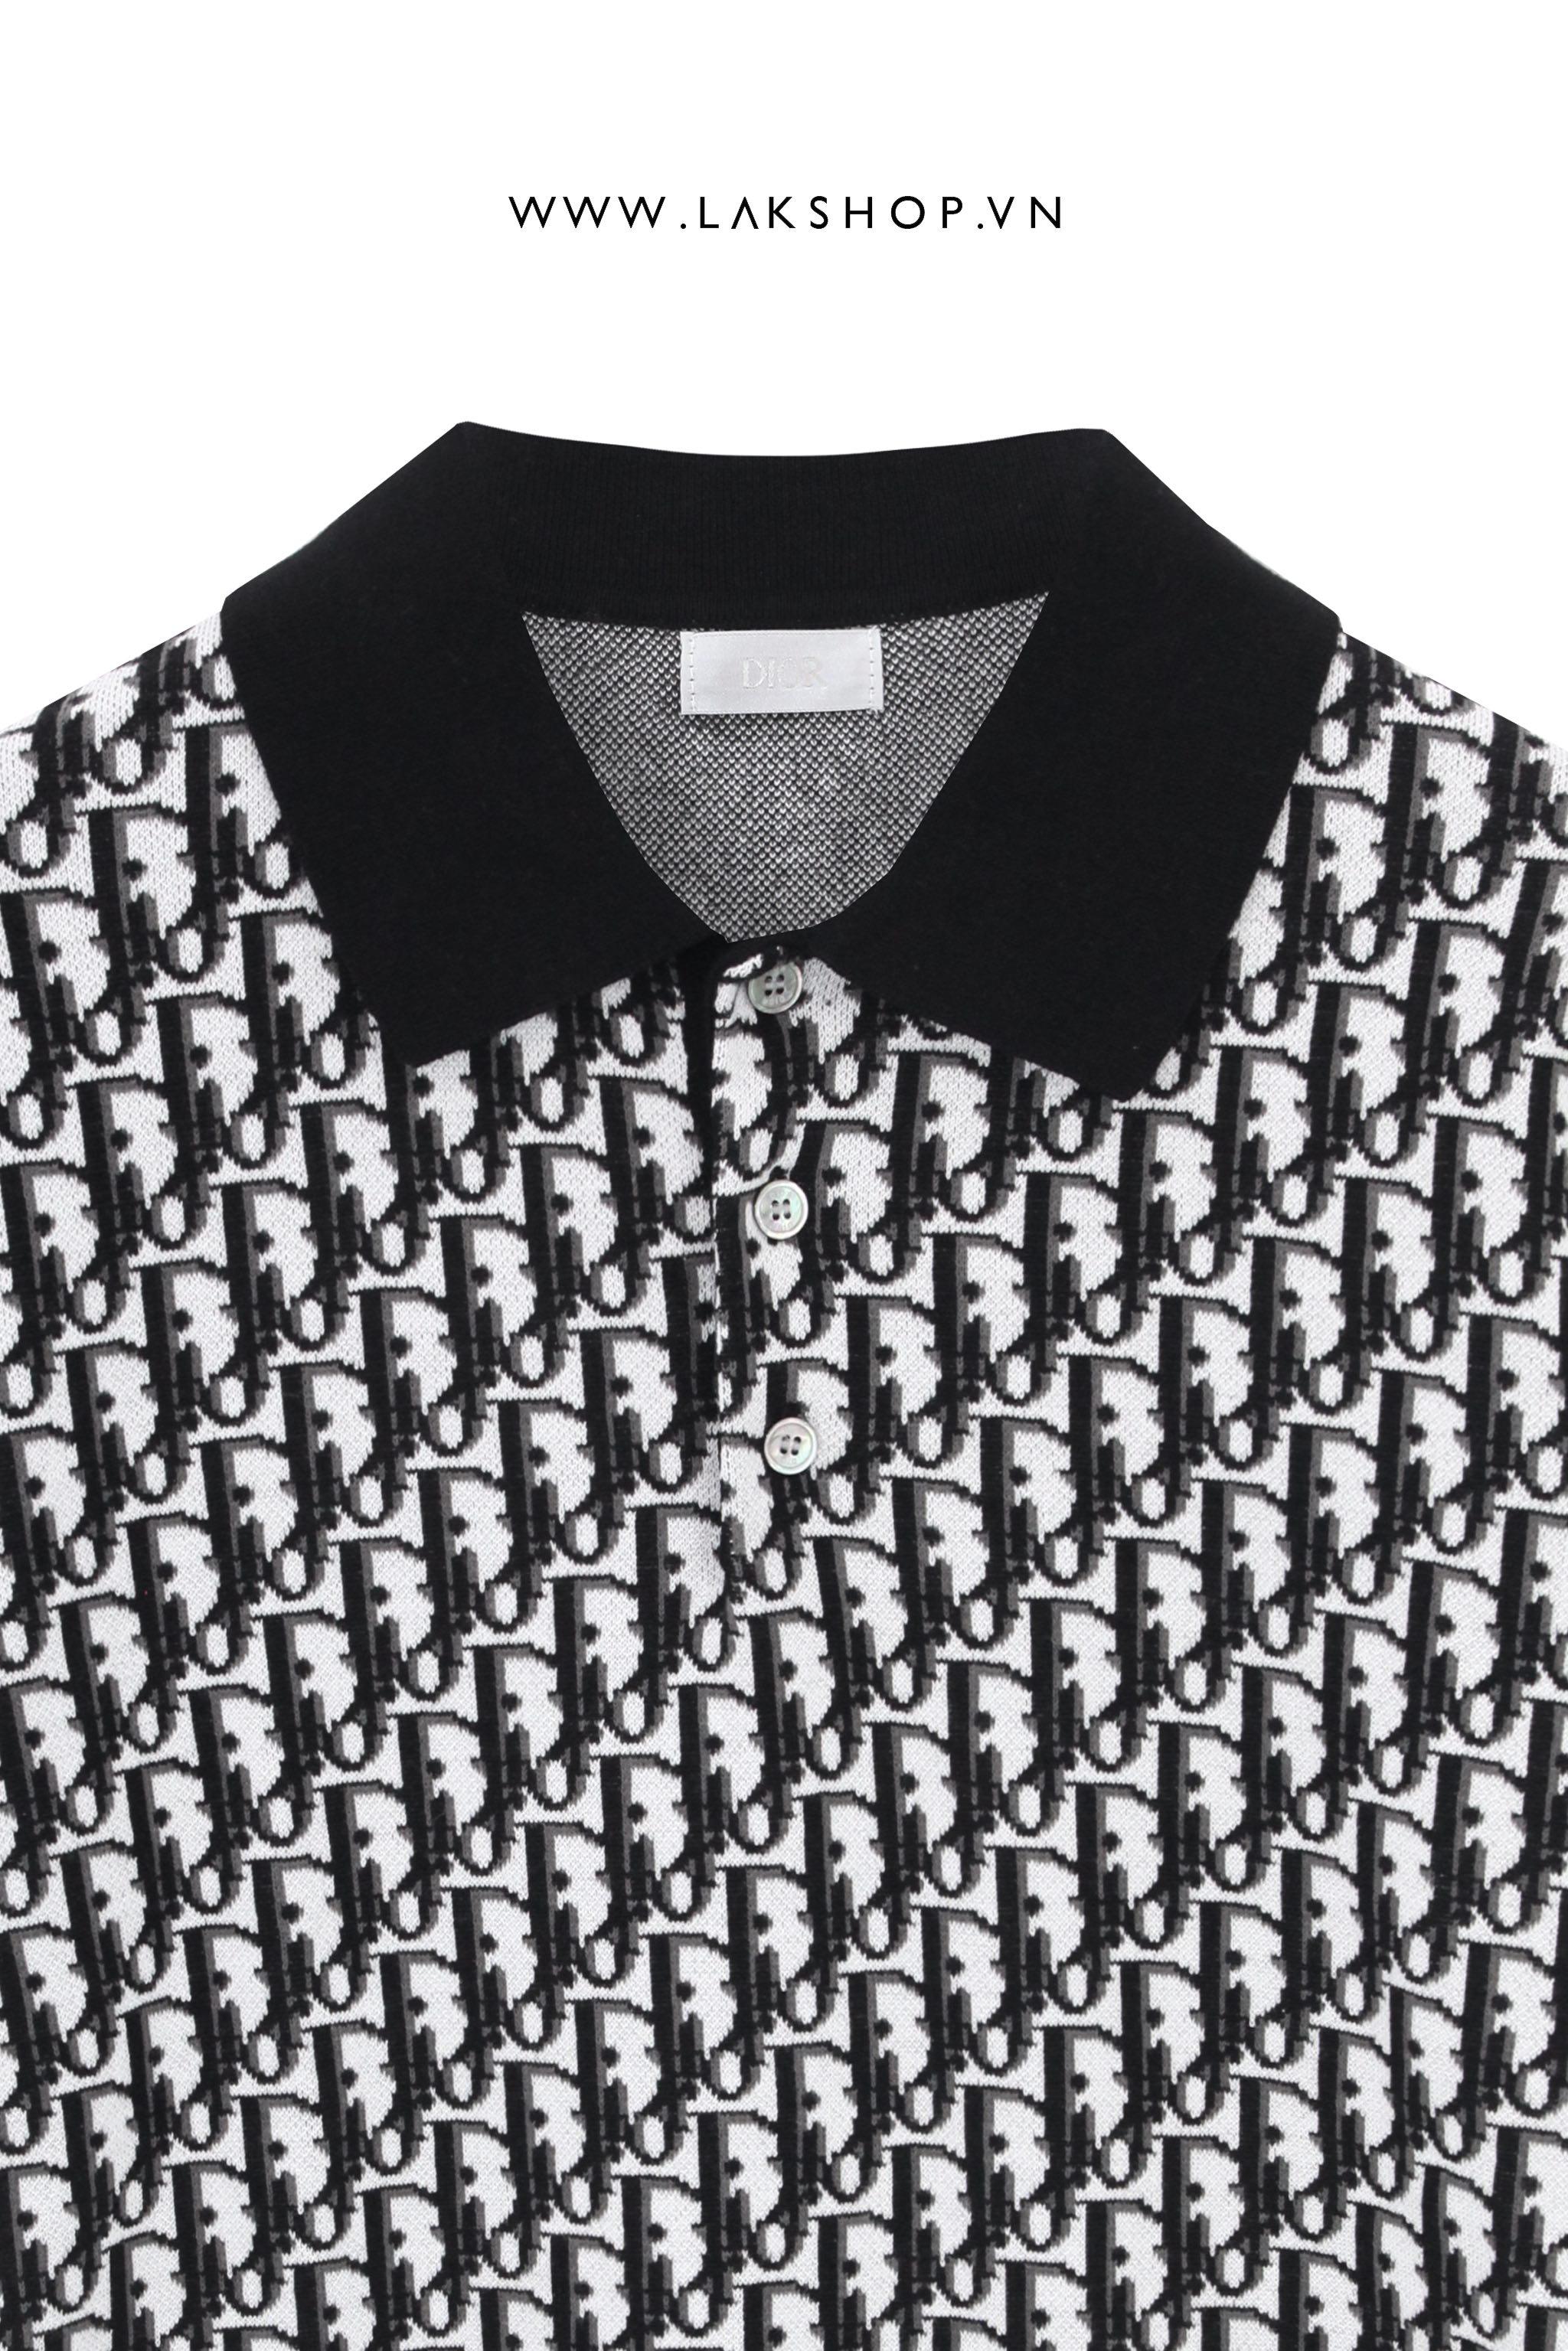 Gucci GG Monogram Mesh Double Shirt